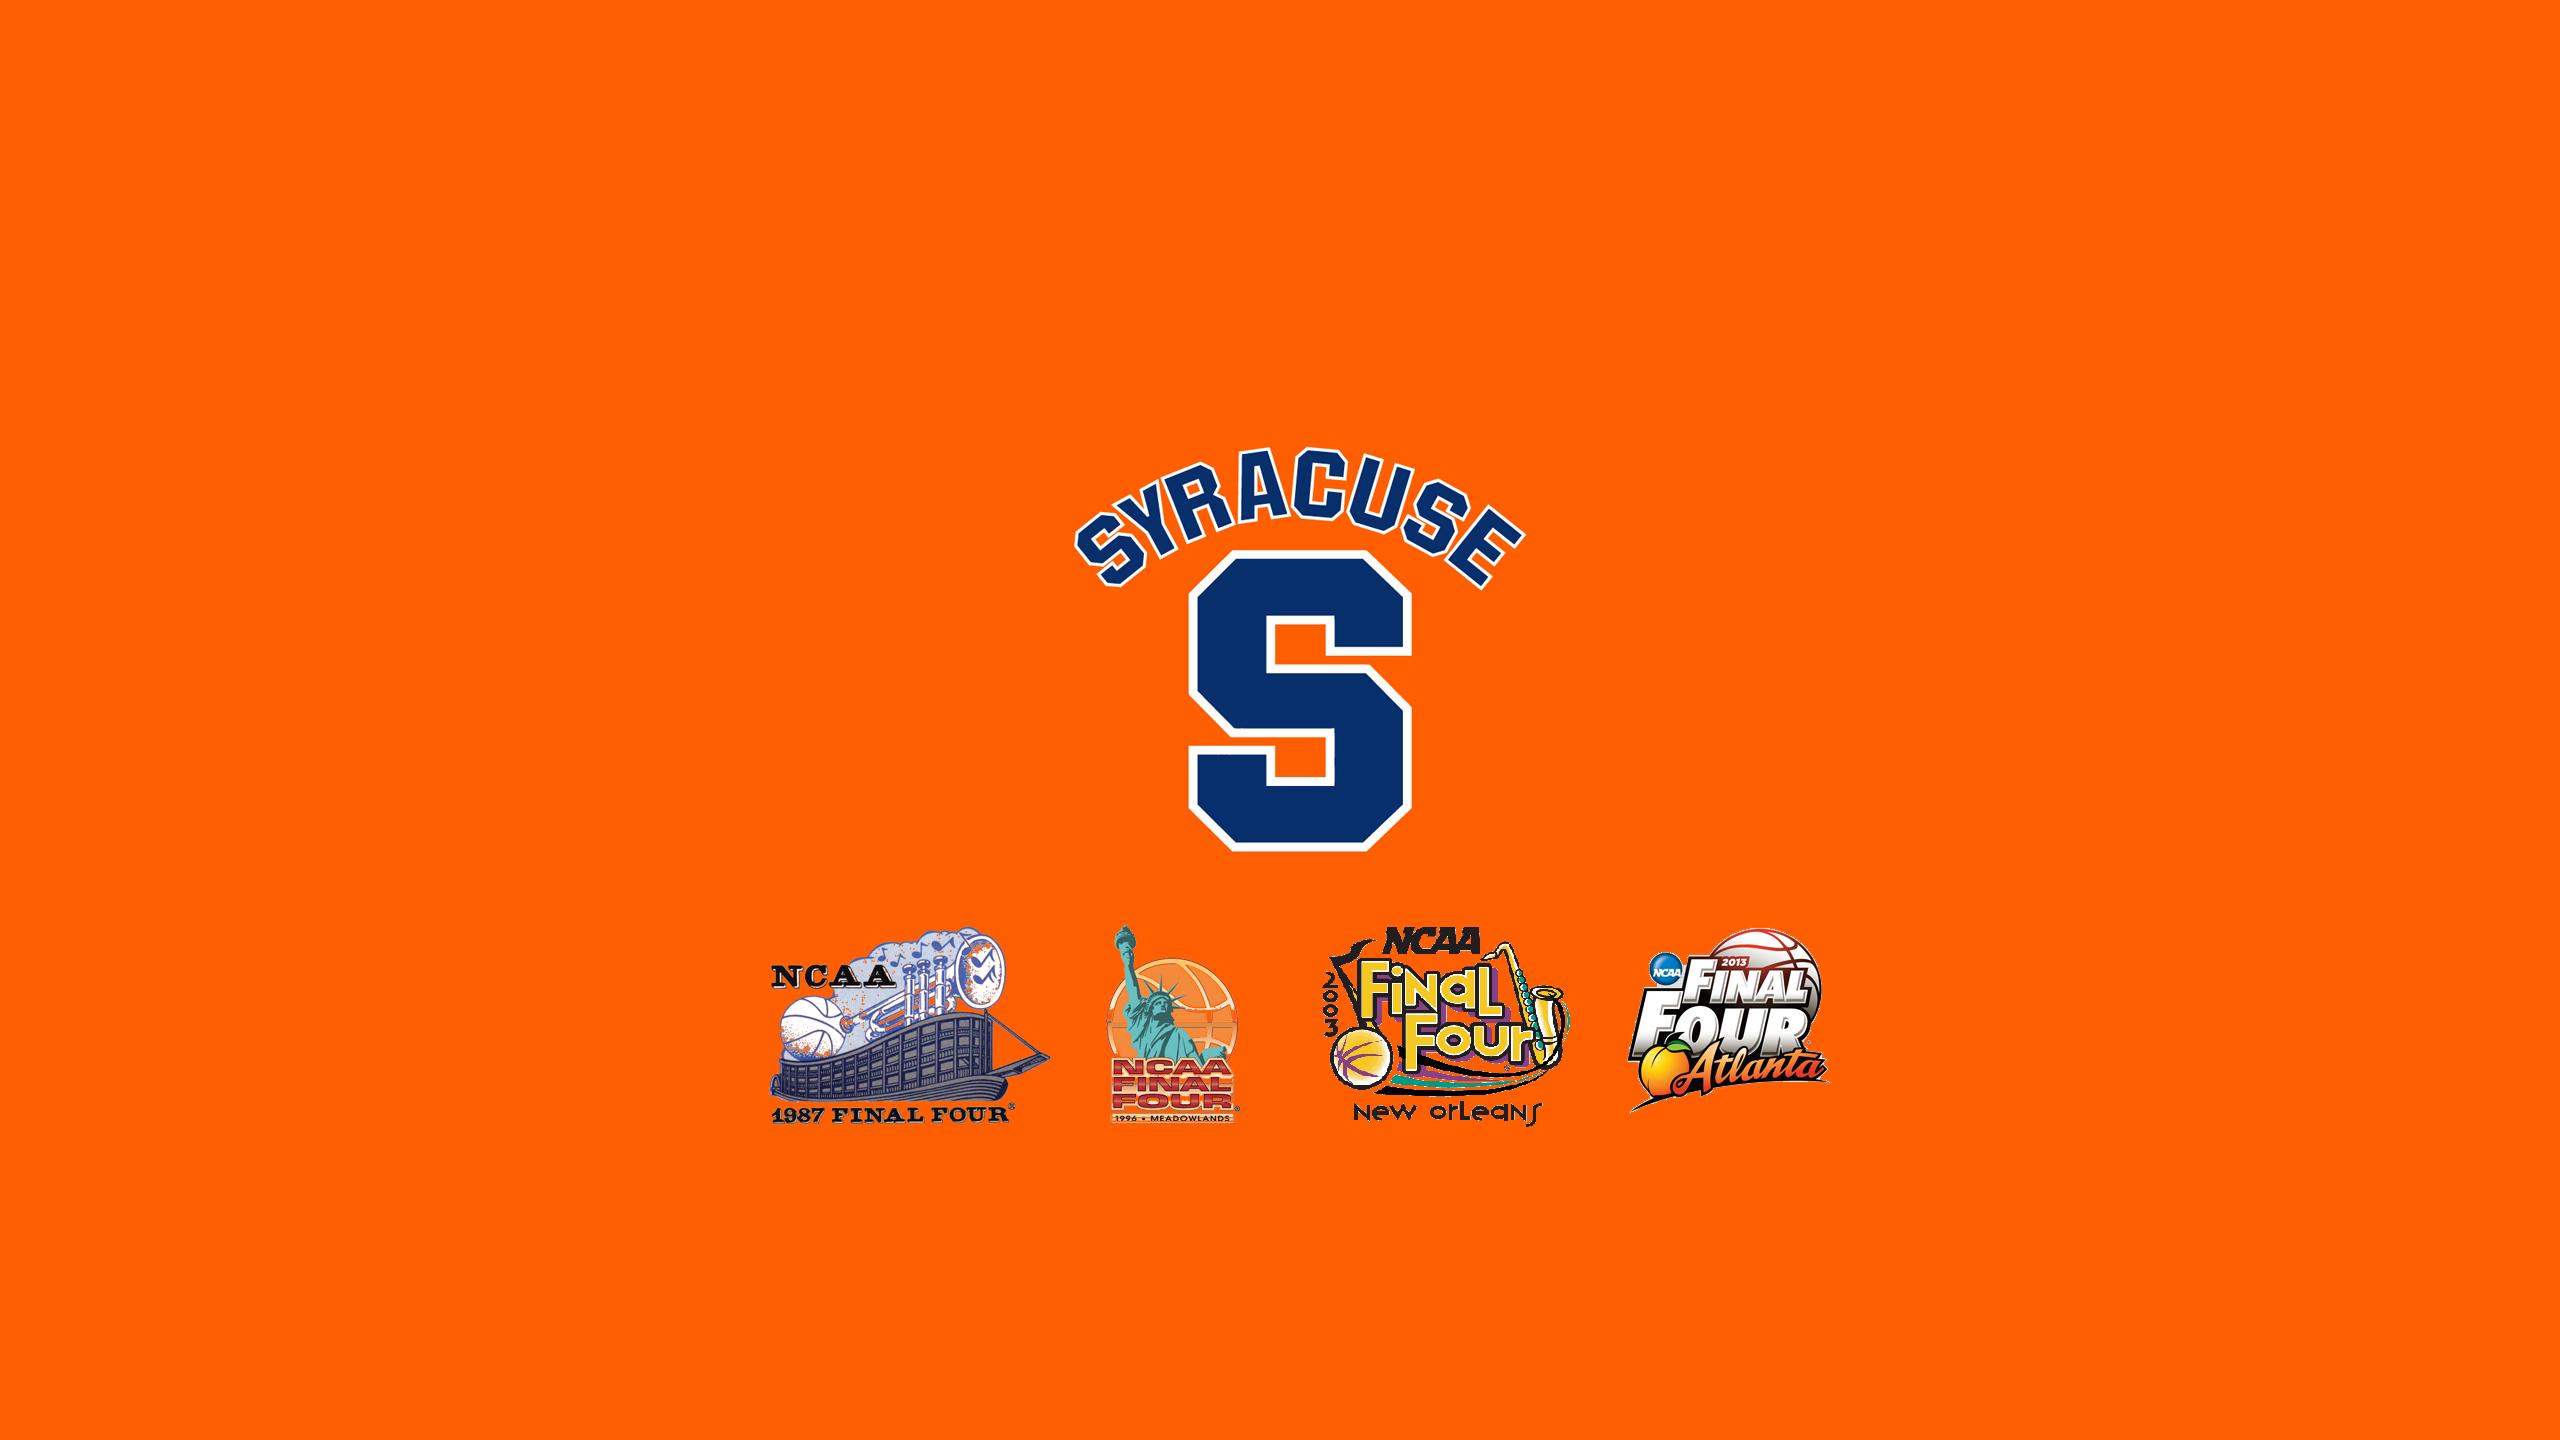 Syracuse Logo Wallpaper Wallpapersafari